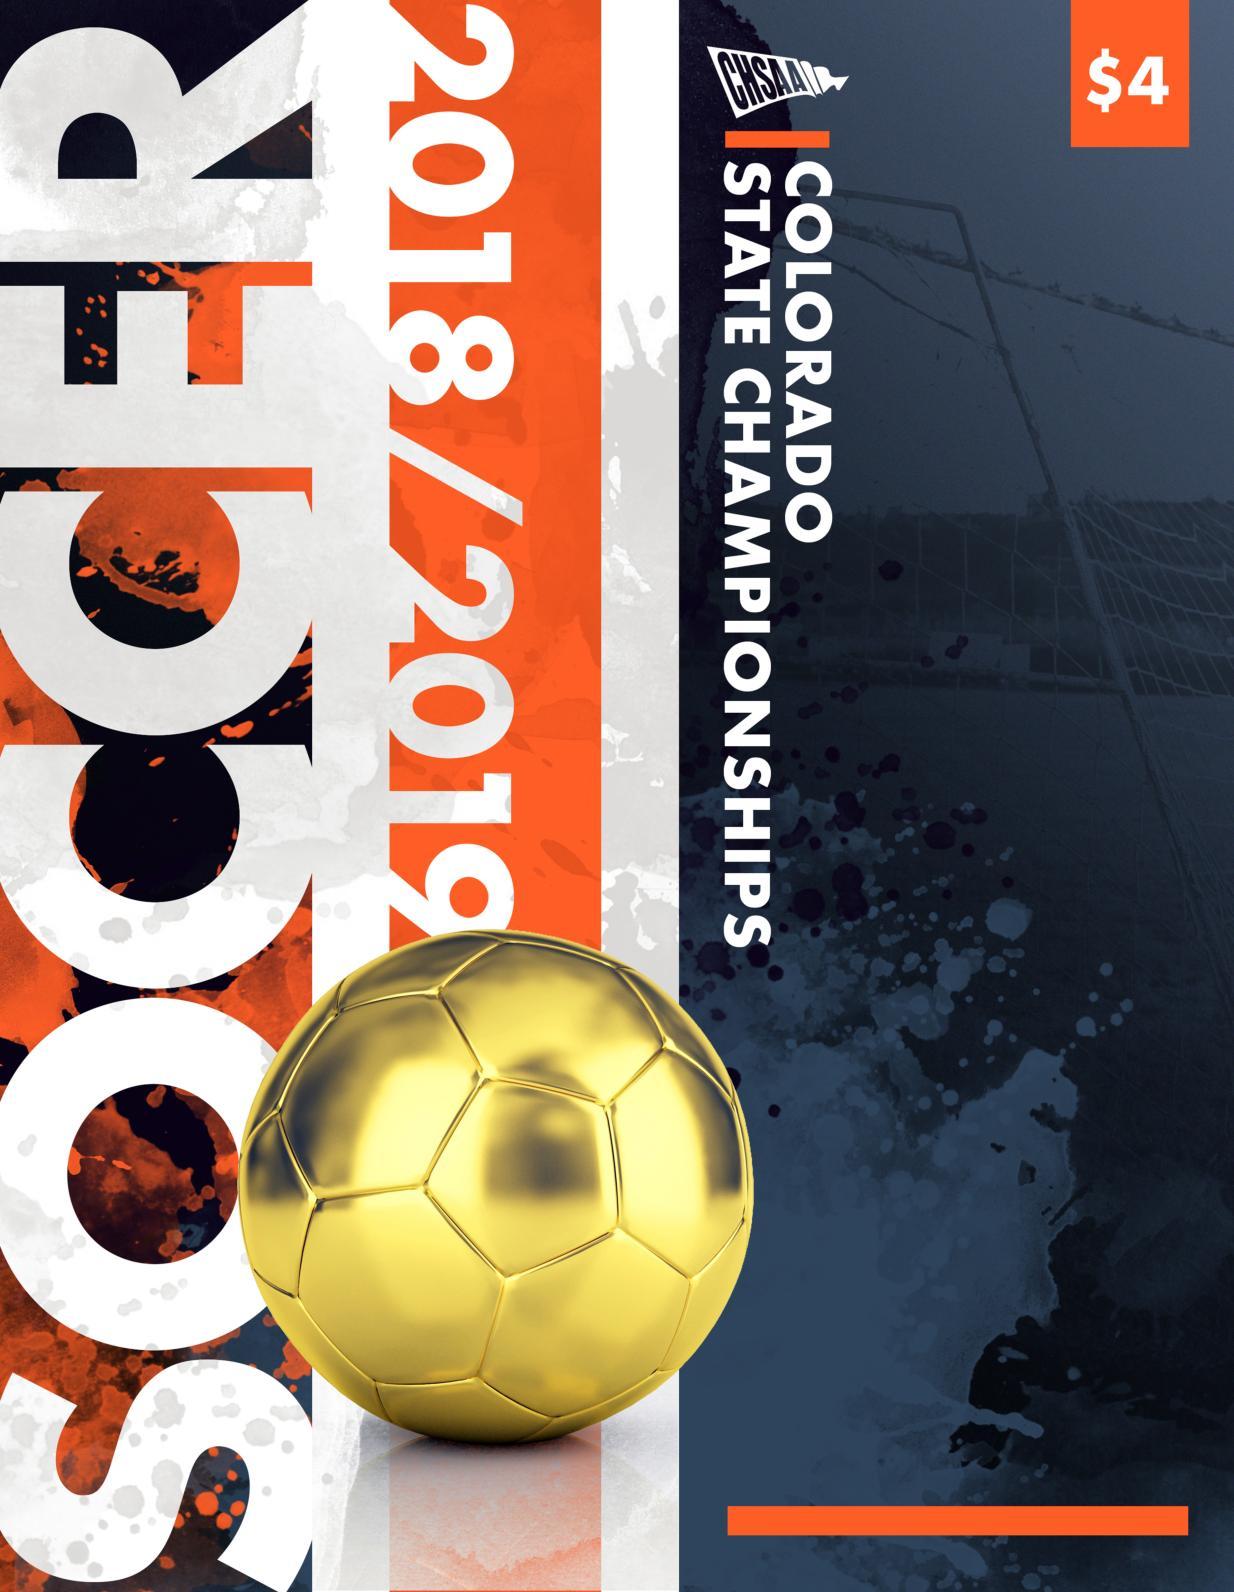 e82c6853a Calaméo - 2018 CHSAA State Boys Soccer Championships